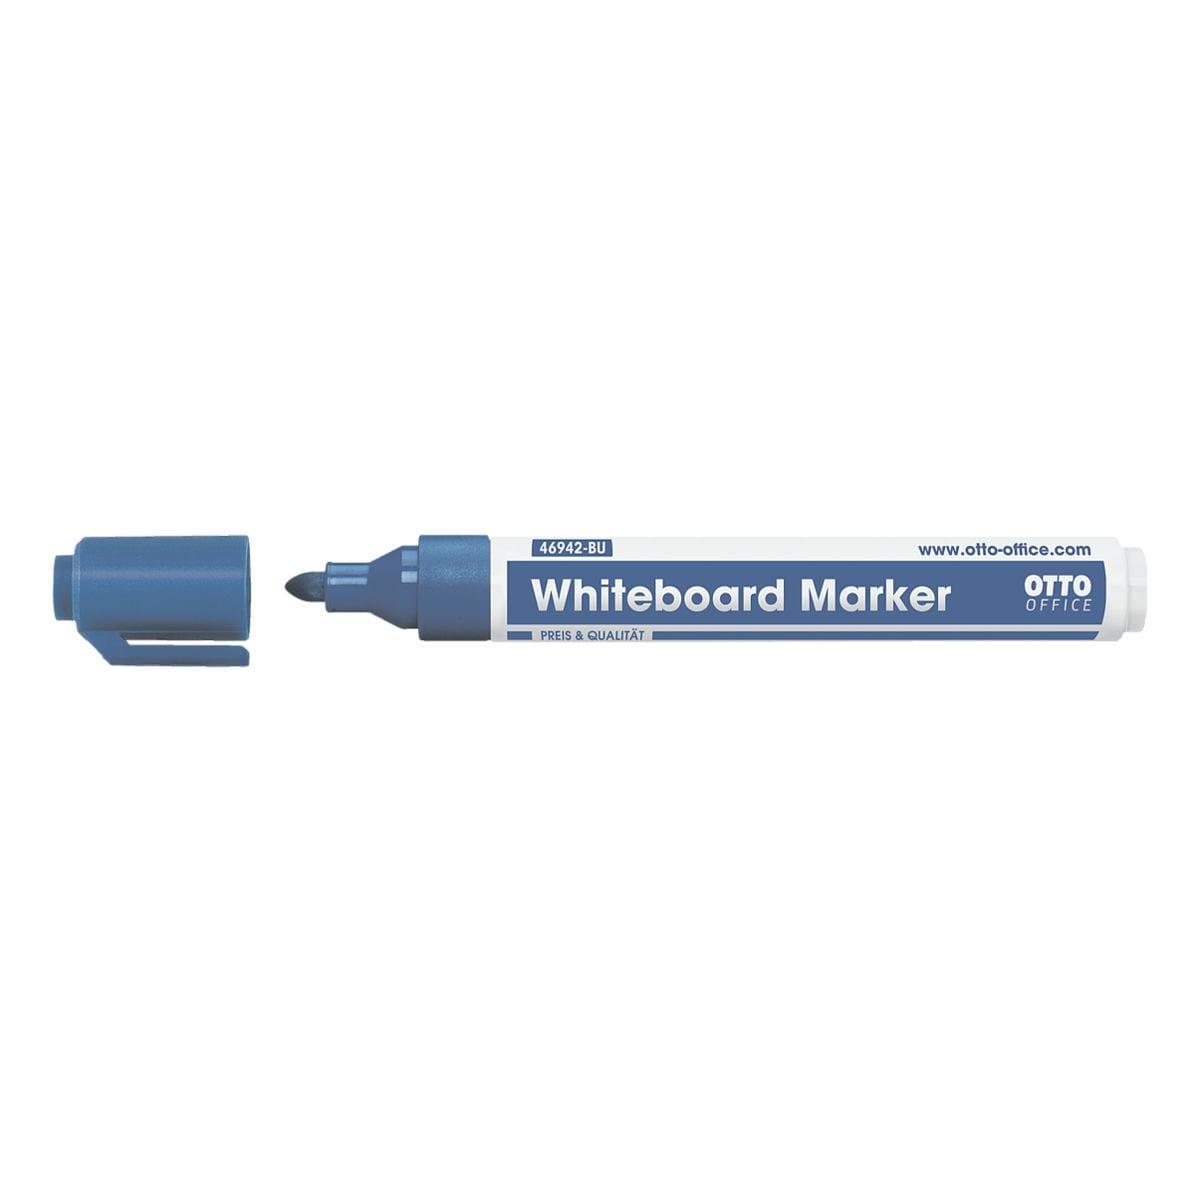 OTTO Office Whiteboard-Marker